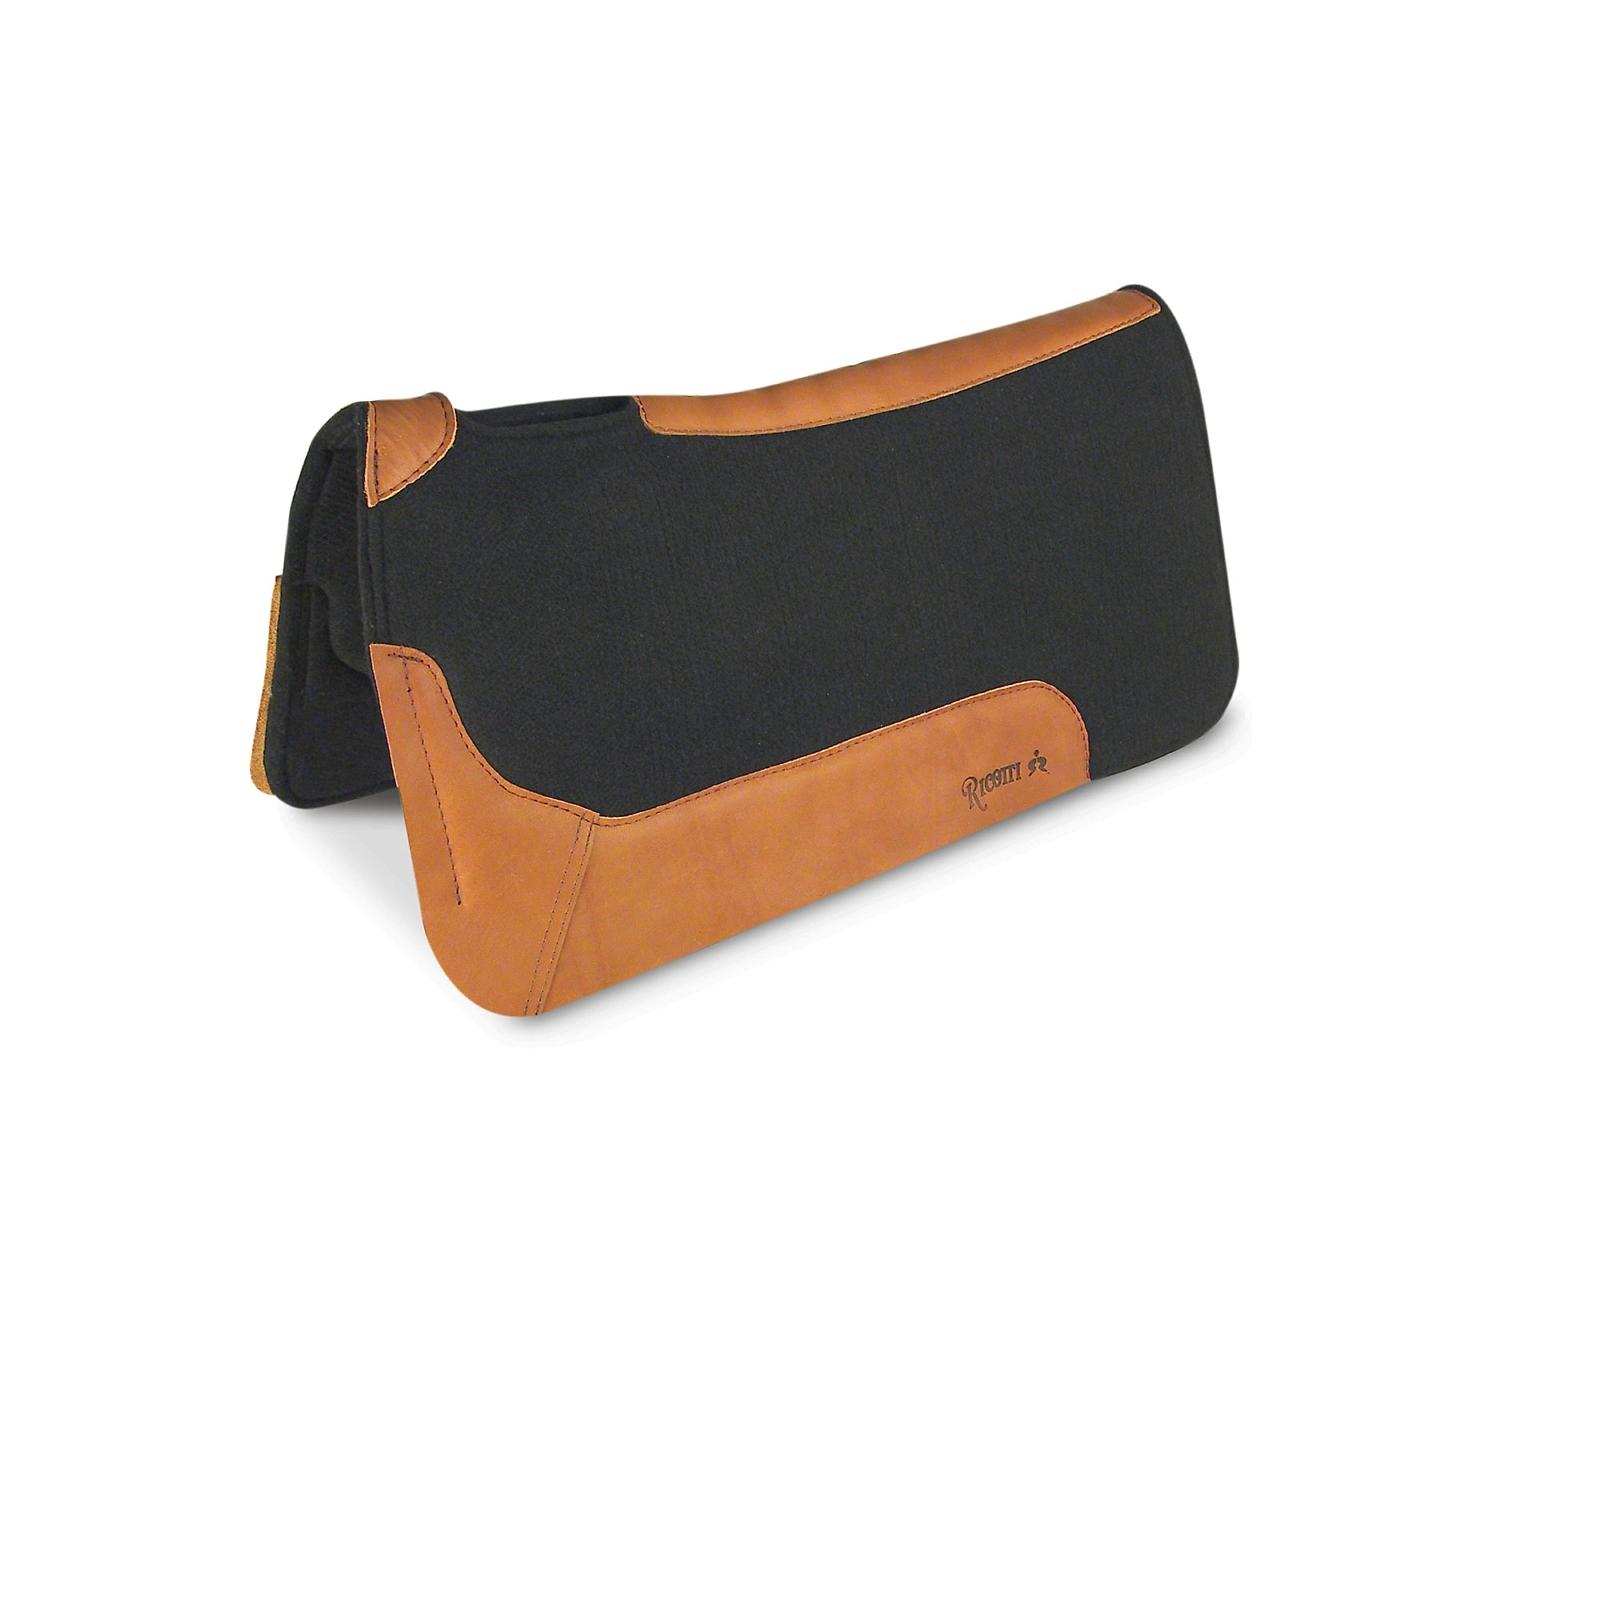 Ricotti Saddle Company Felt Standard Polyester Pad